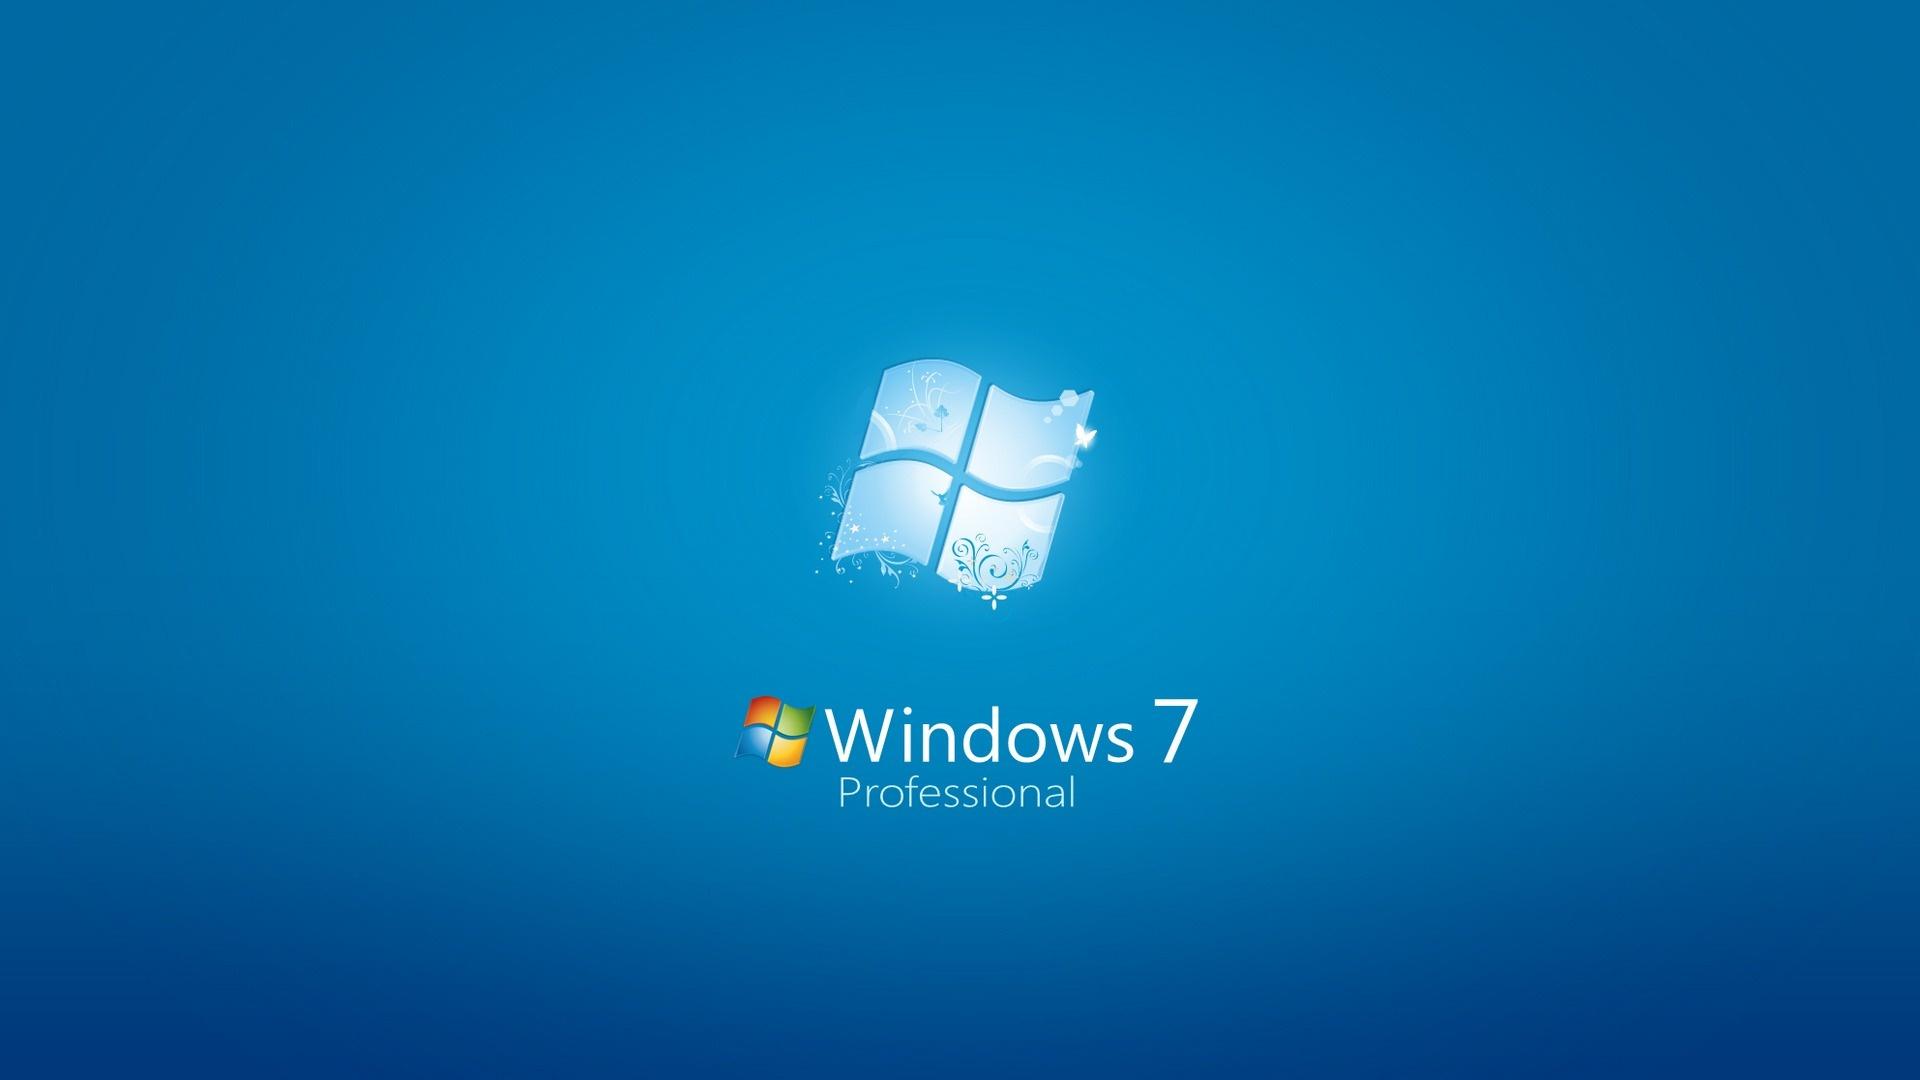 2 background images windows 7 - Http Www Themebin Com Hd Wallpapers Windows